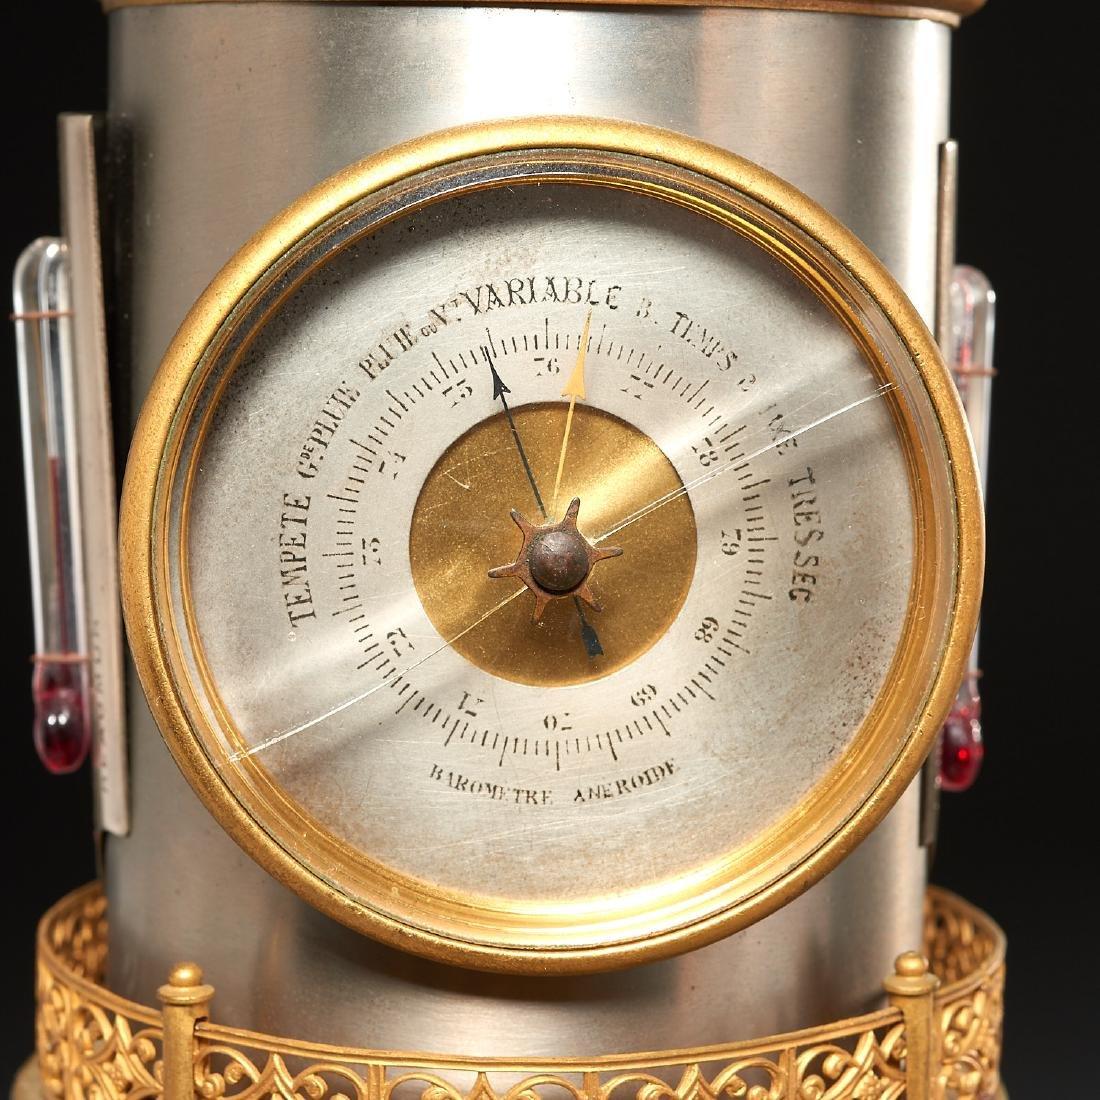 Belle Epoque automaton lighthouse clock barometer - 4